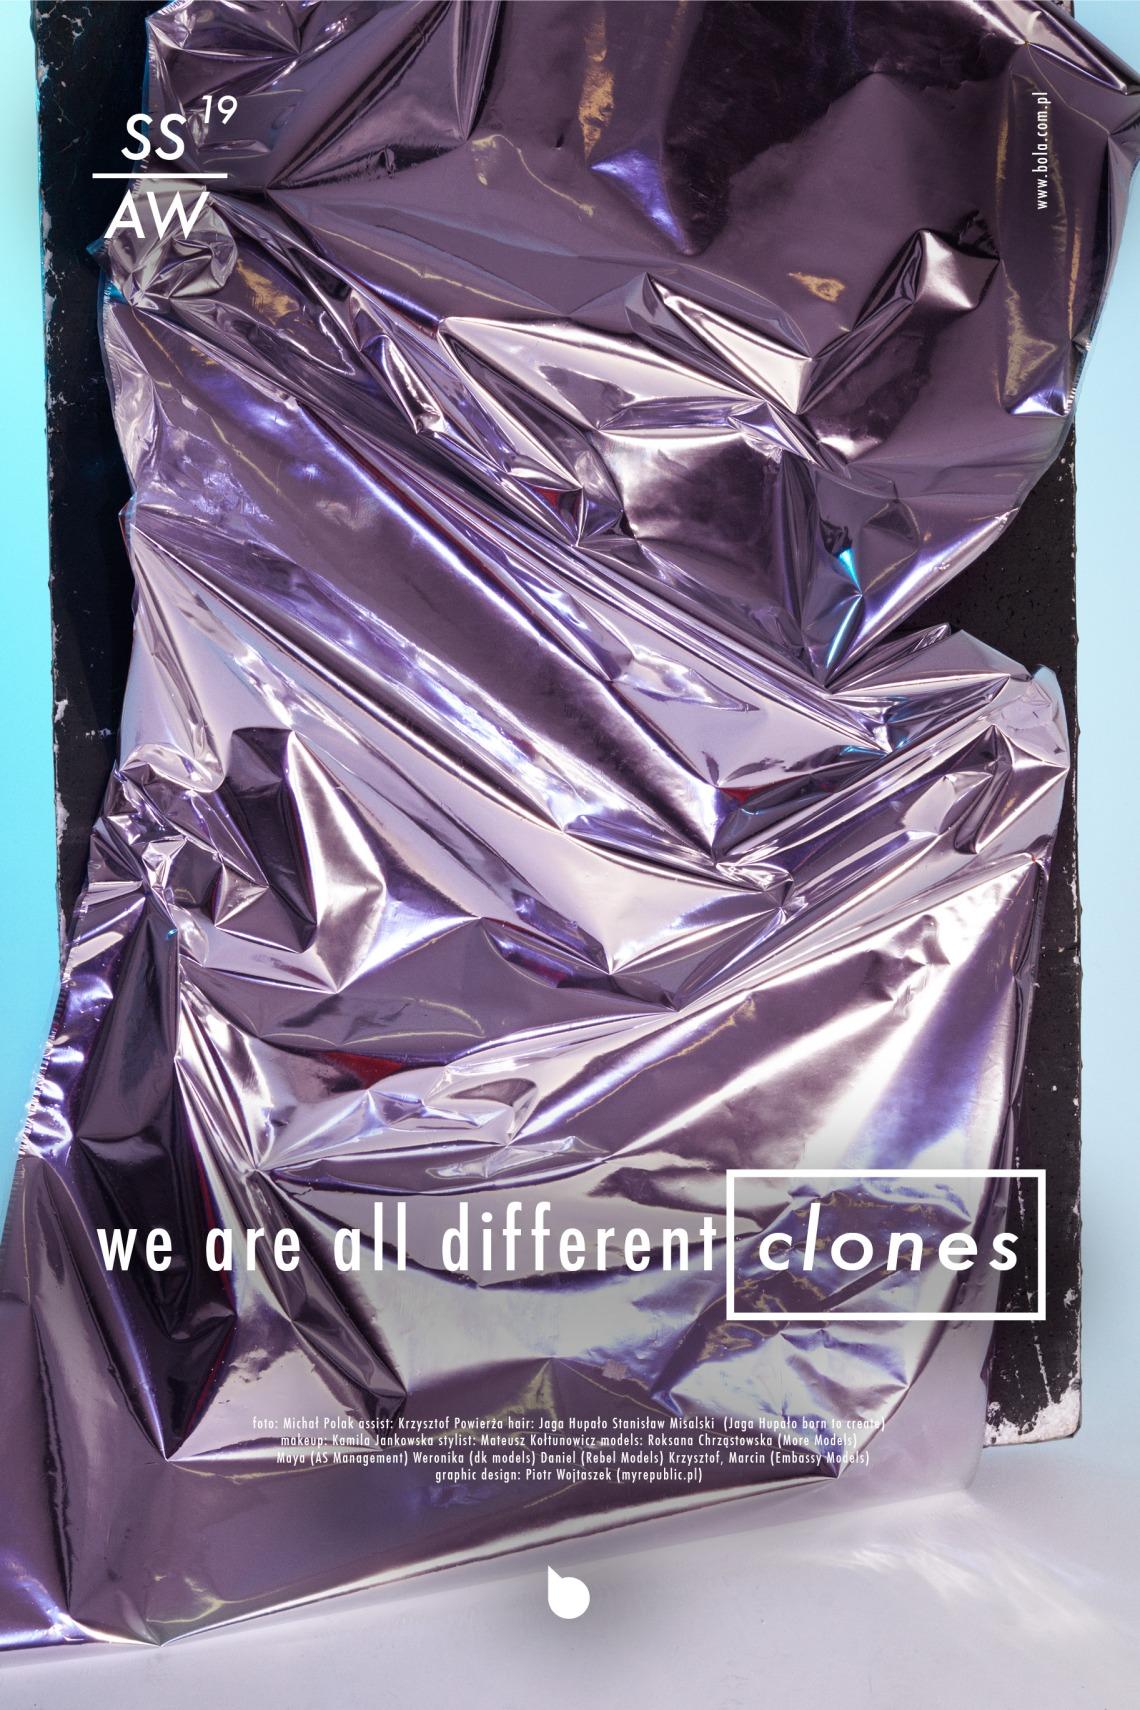 bola cloner 2019 campaign_web_large1